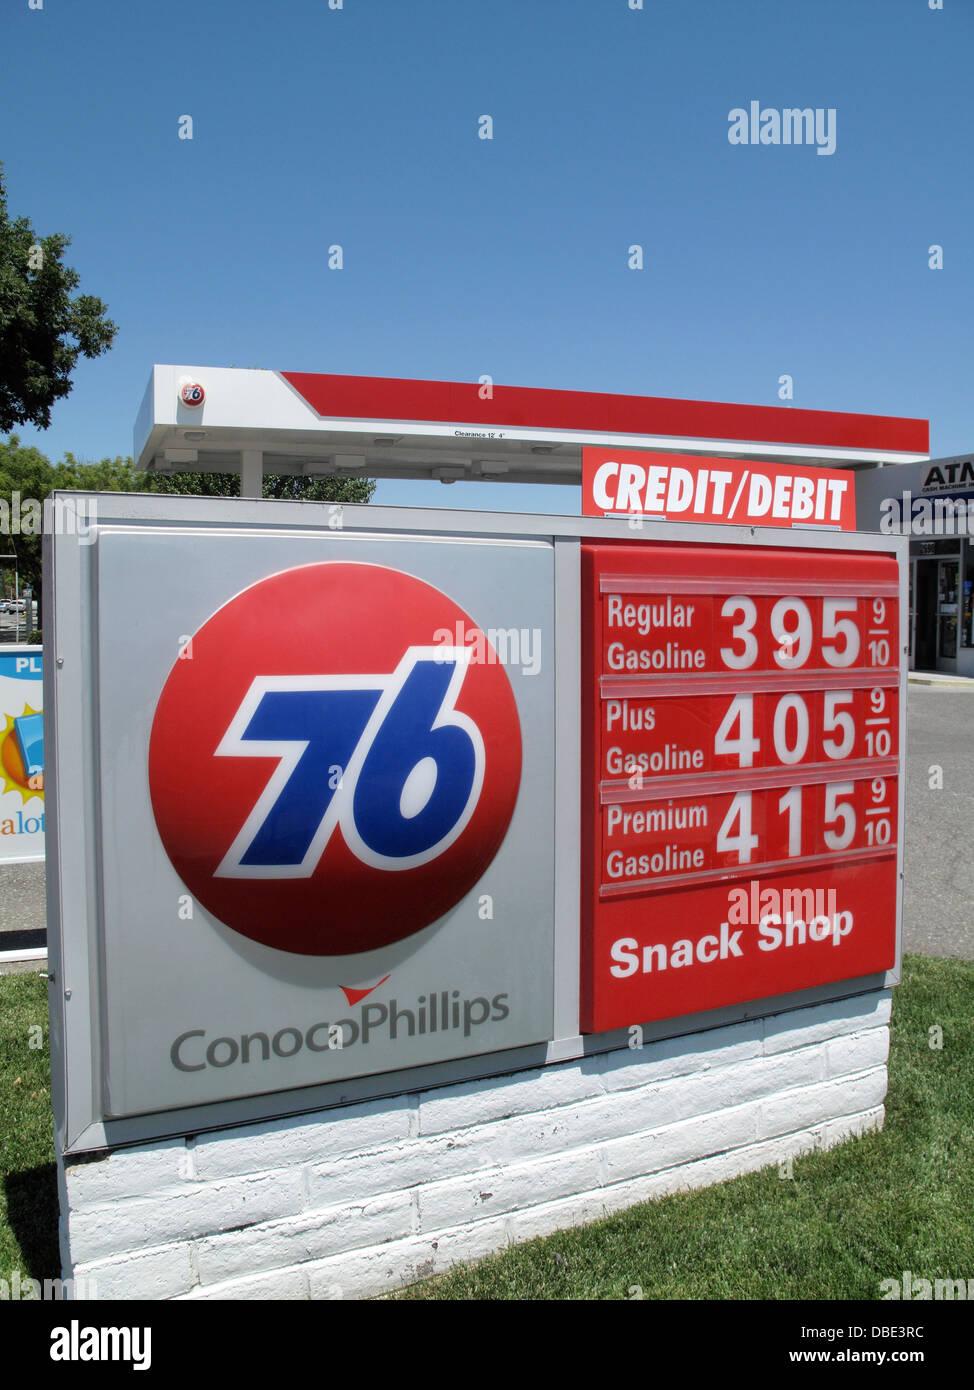 ConocoPhillips 76 gas station price sign in San Jose, California